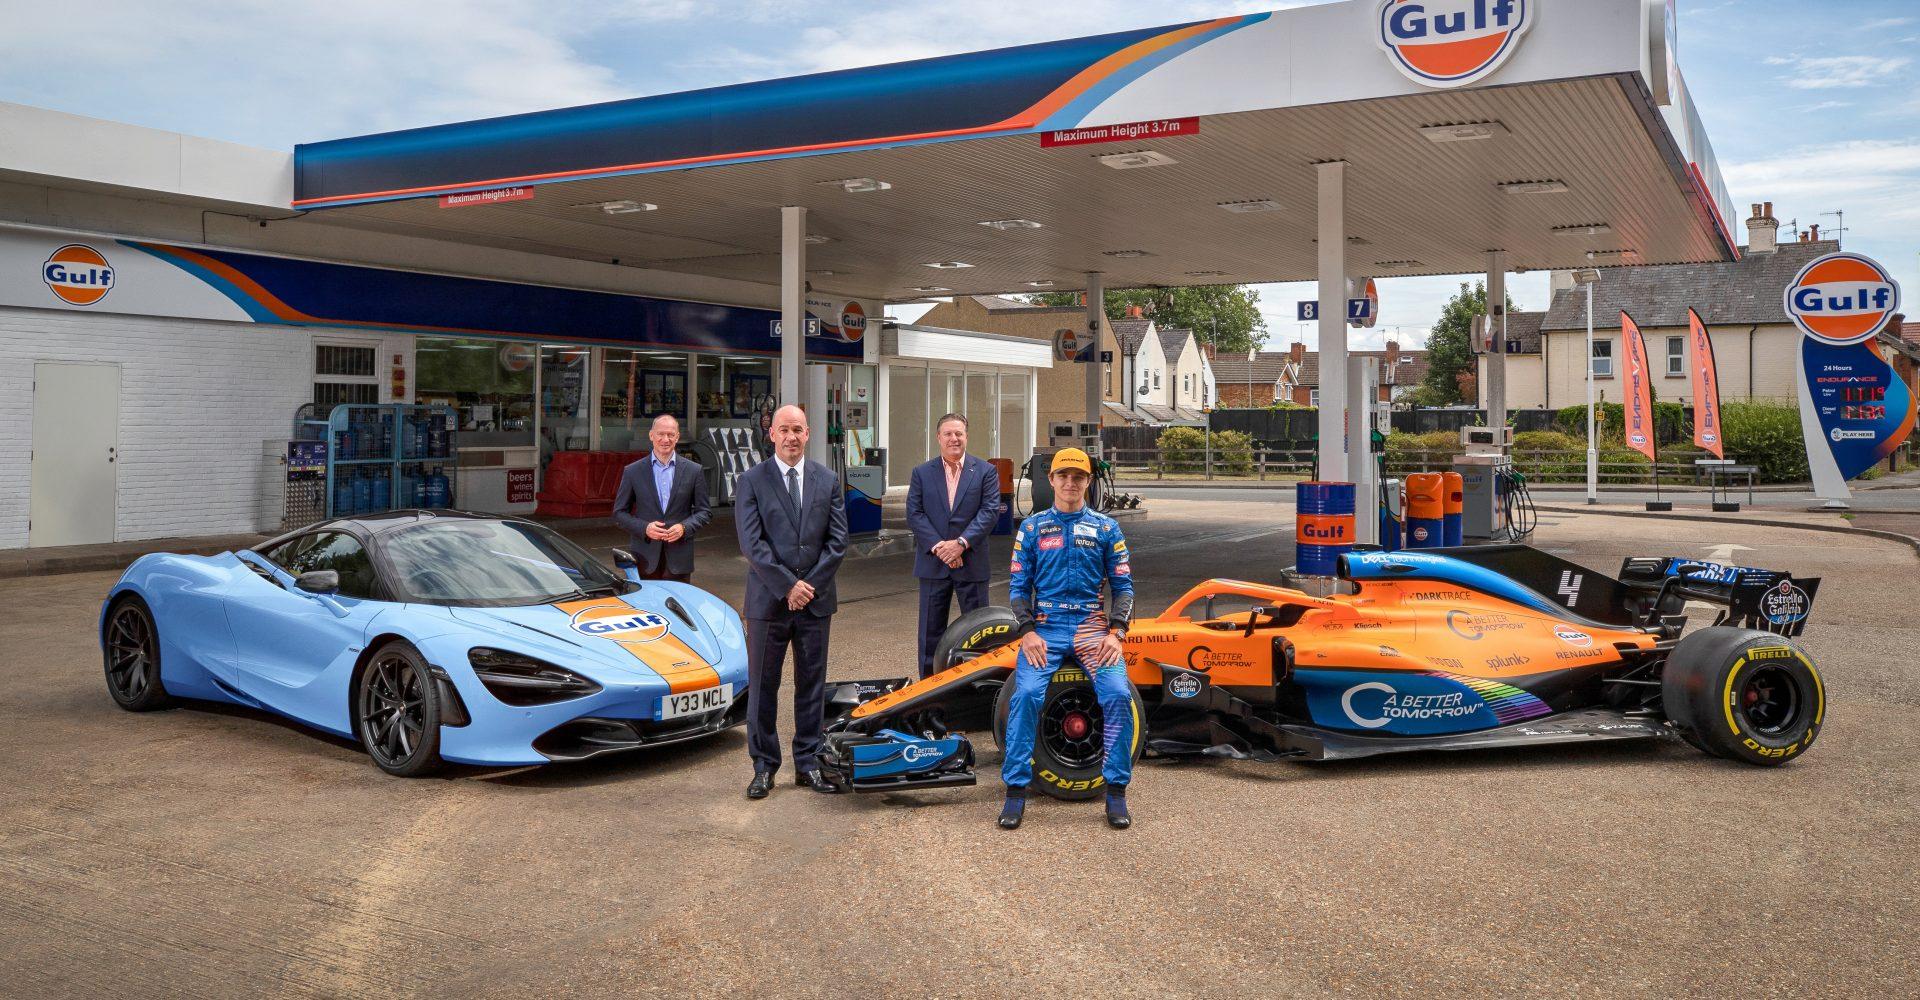 McLaren announces multi-year partnership with Gulf Oil